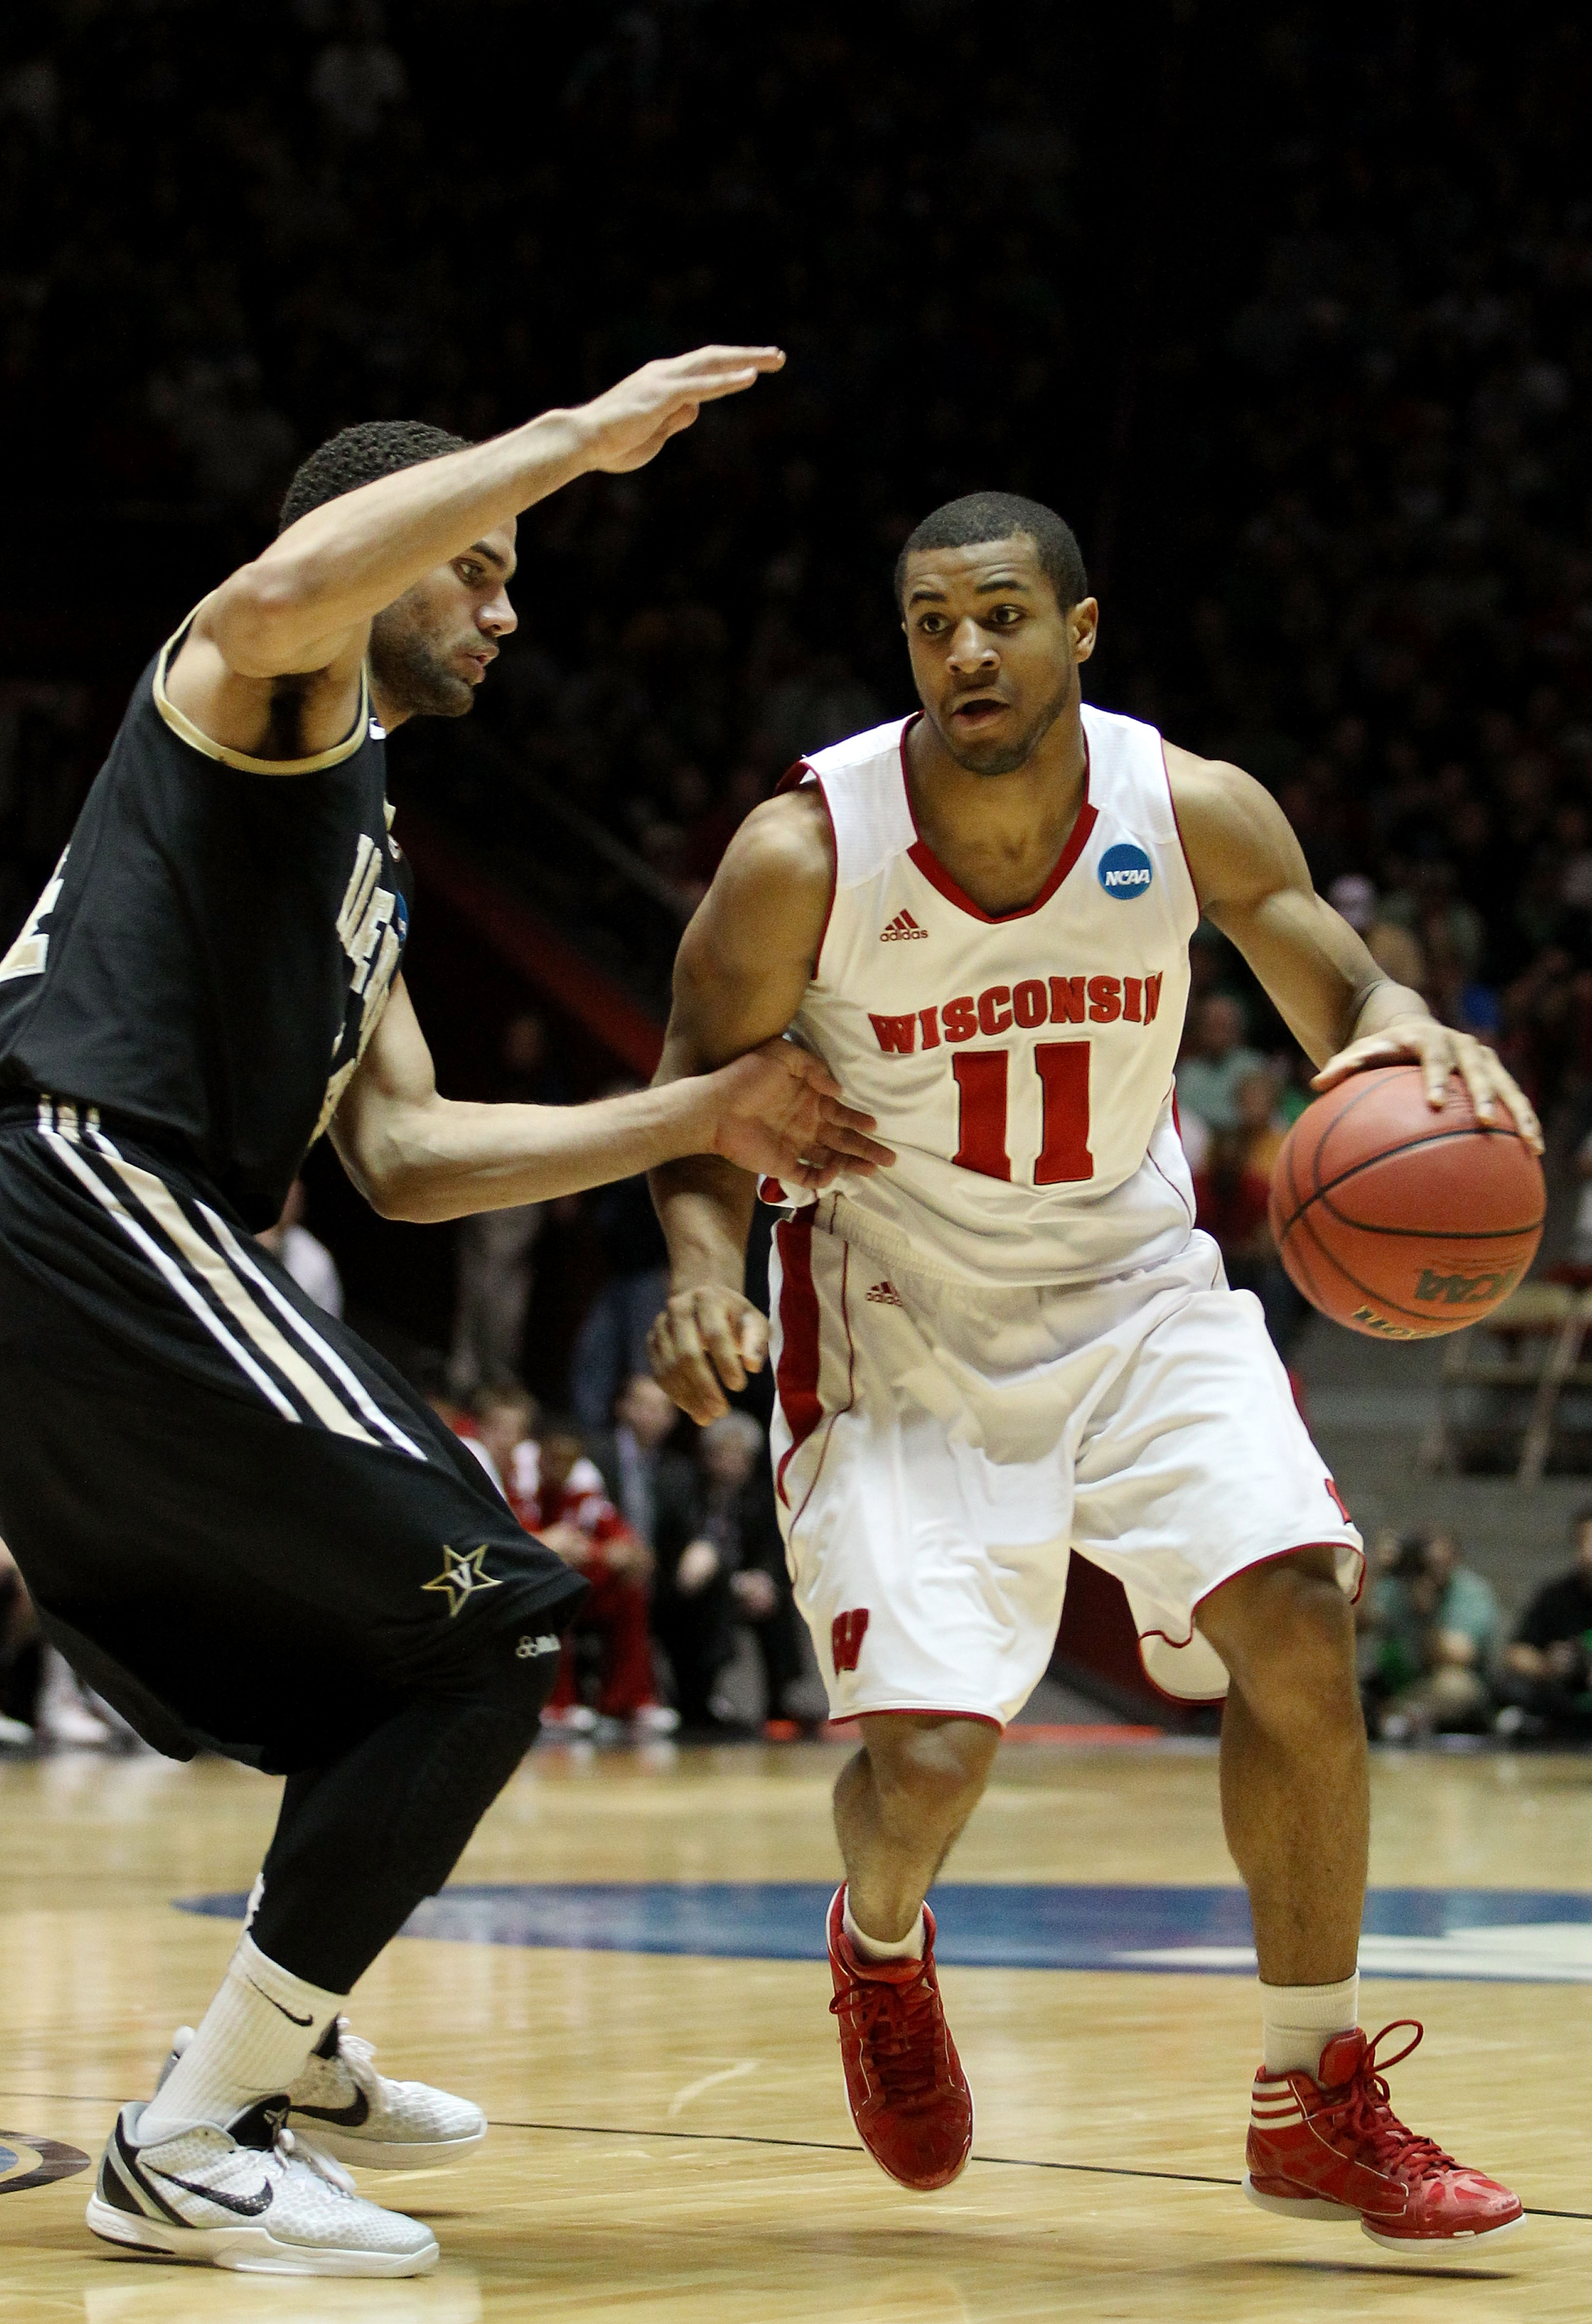 NCAA Basketball Tournament - Vanderbilt v Wisconsin